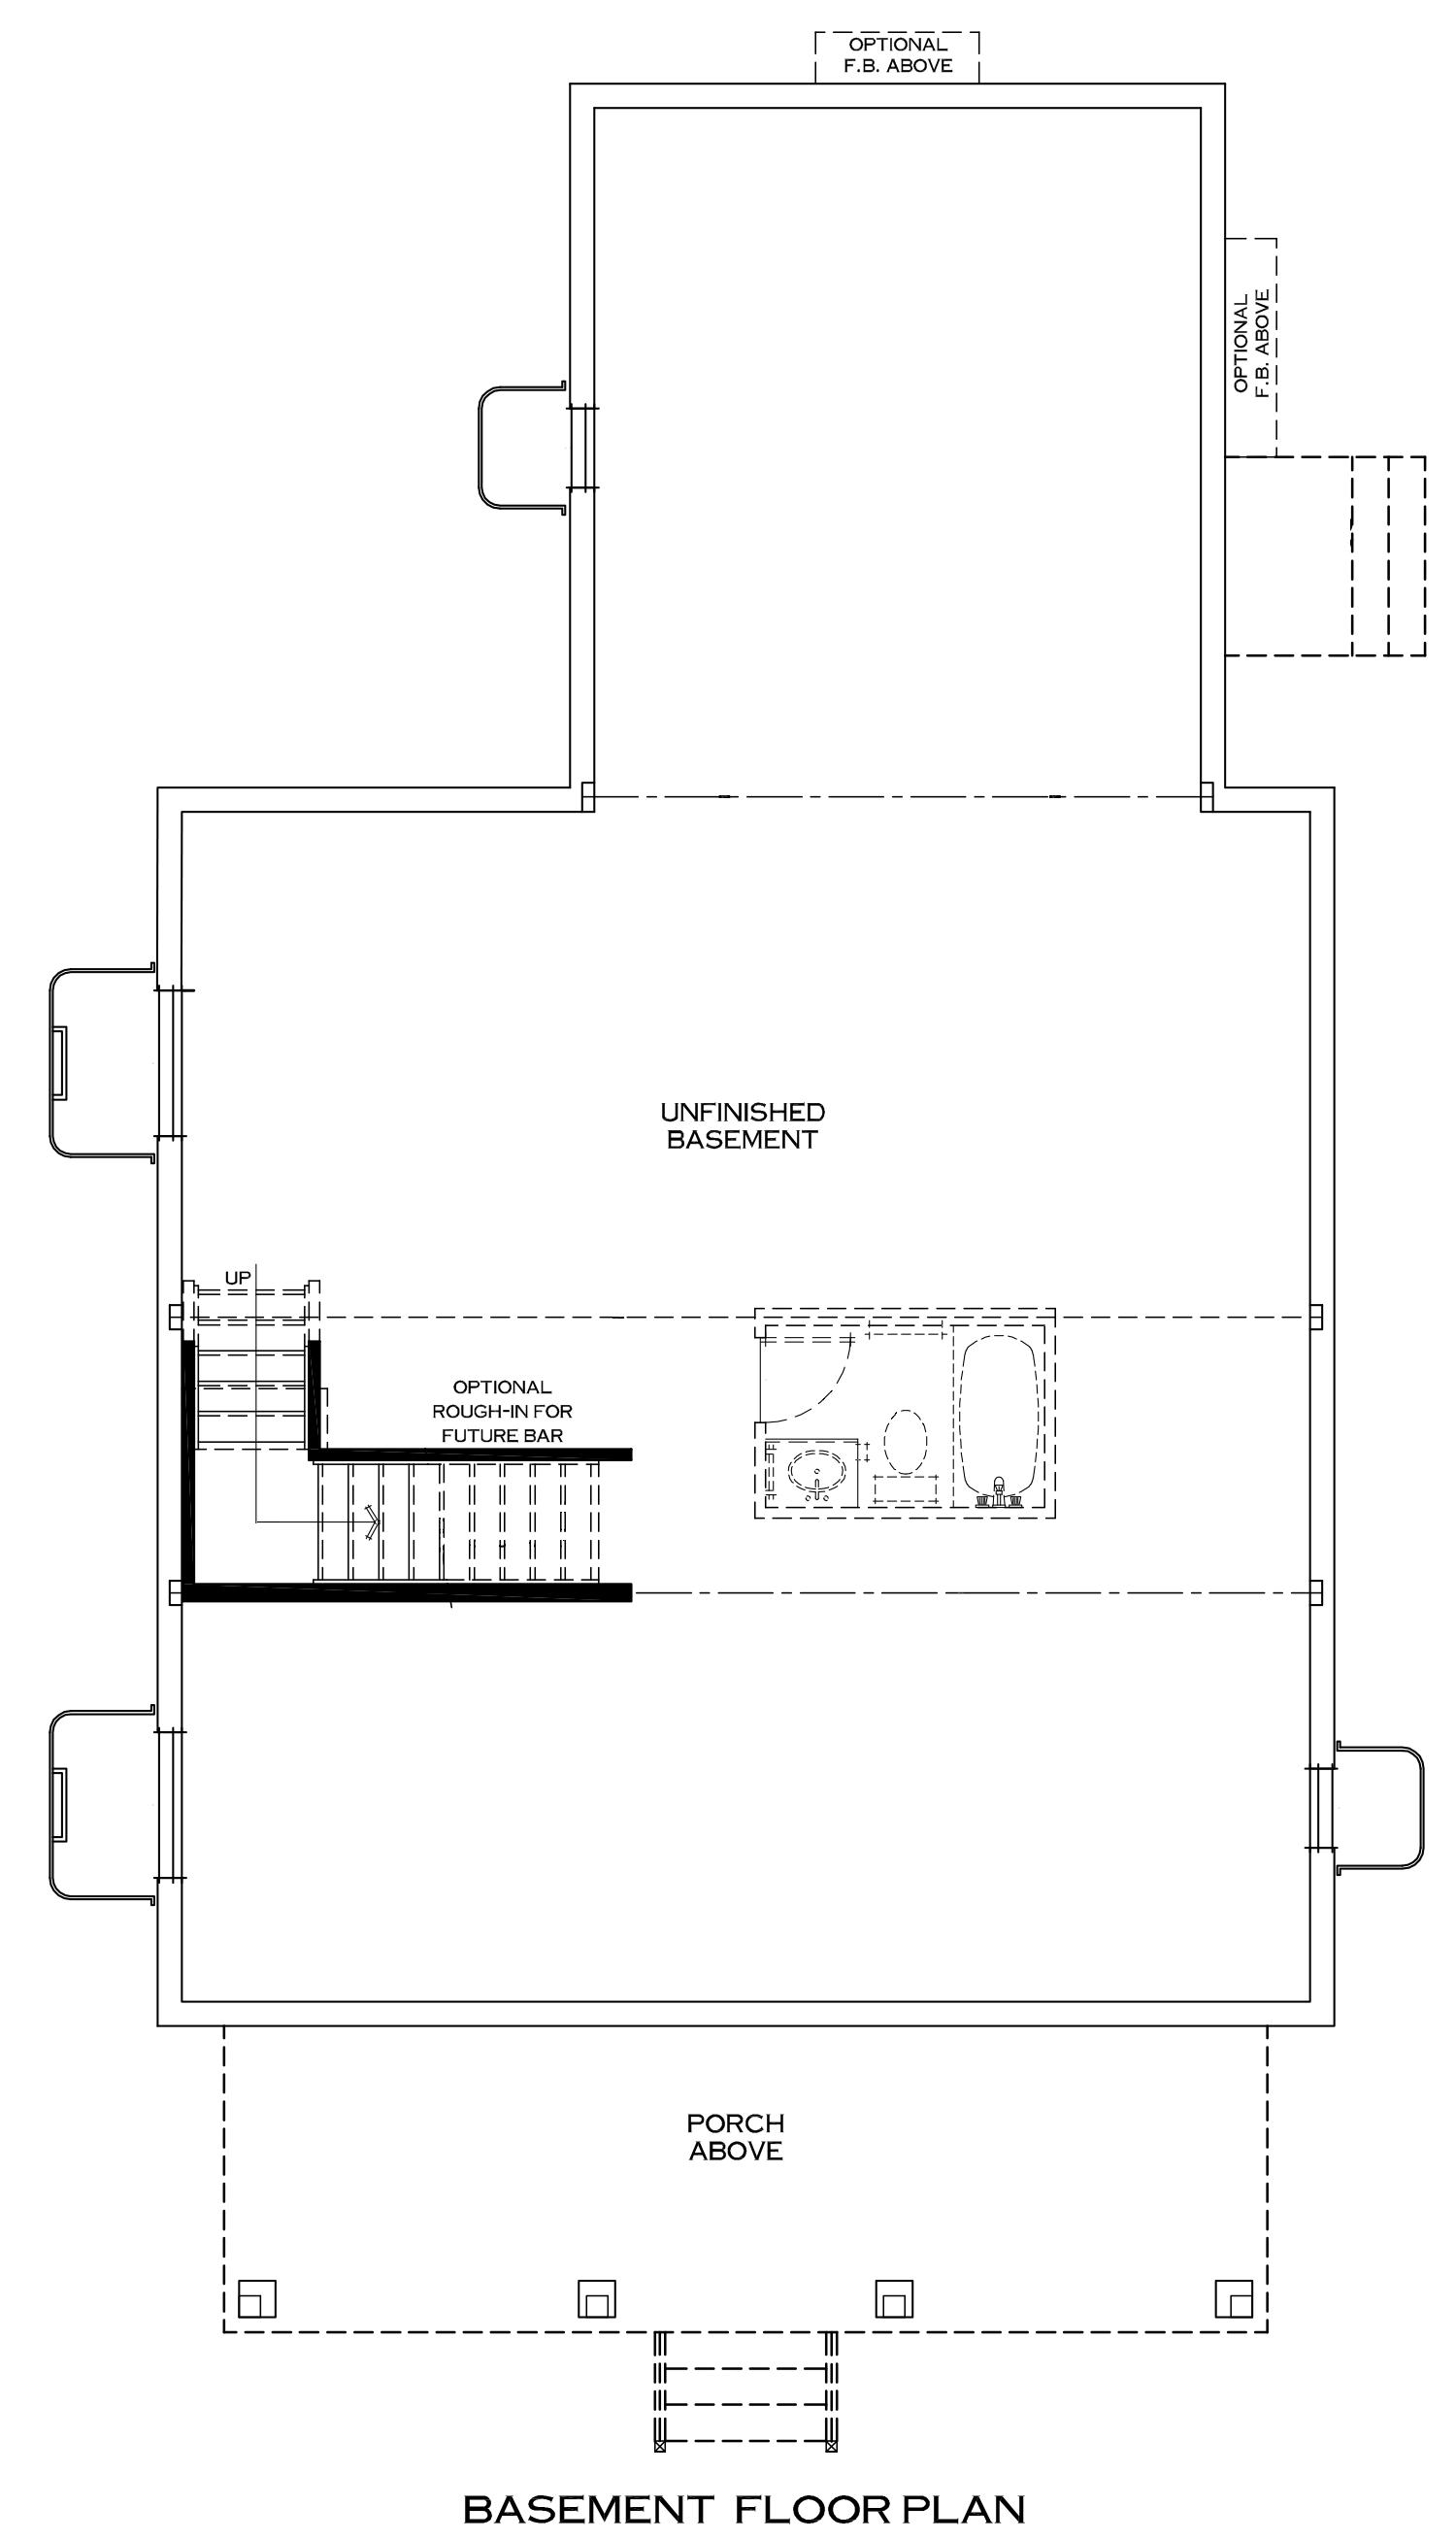 1-Chestertown S-D Std Basement Floor.png